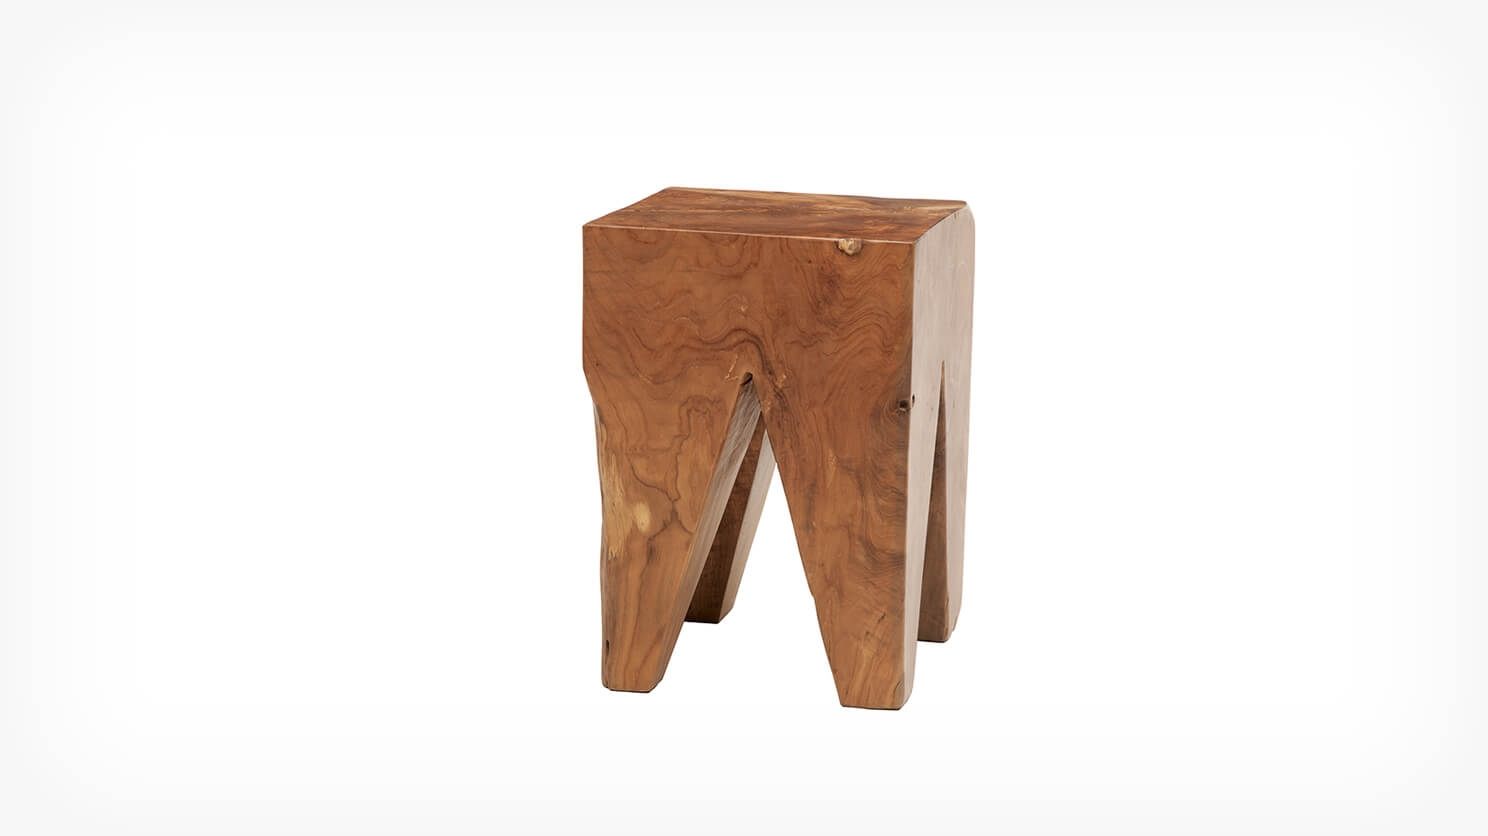 Solid Teak Wood Stool - Square | EQ3